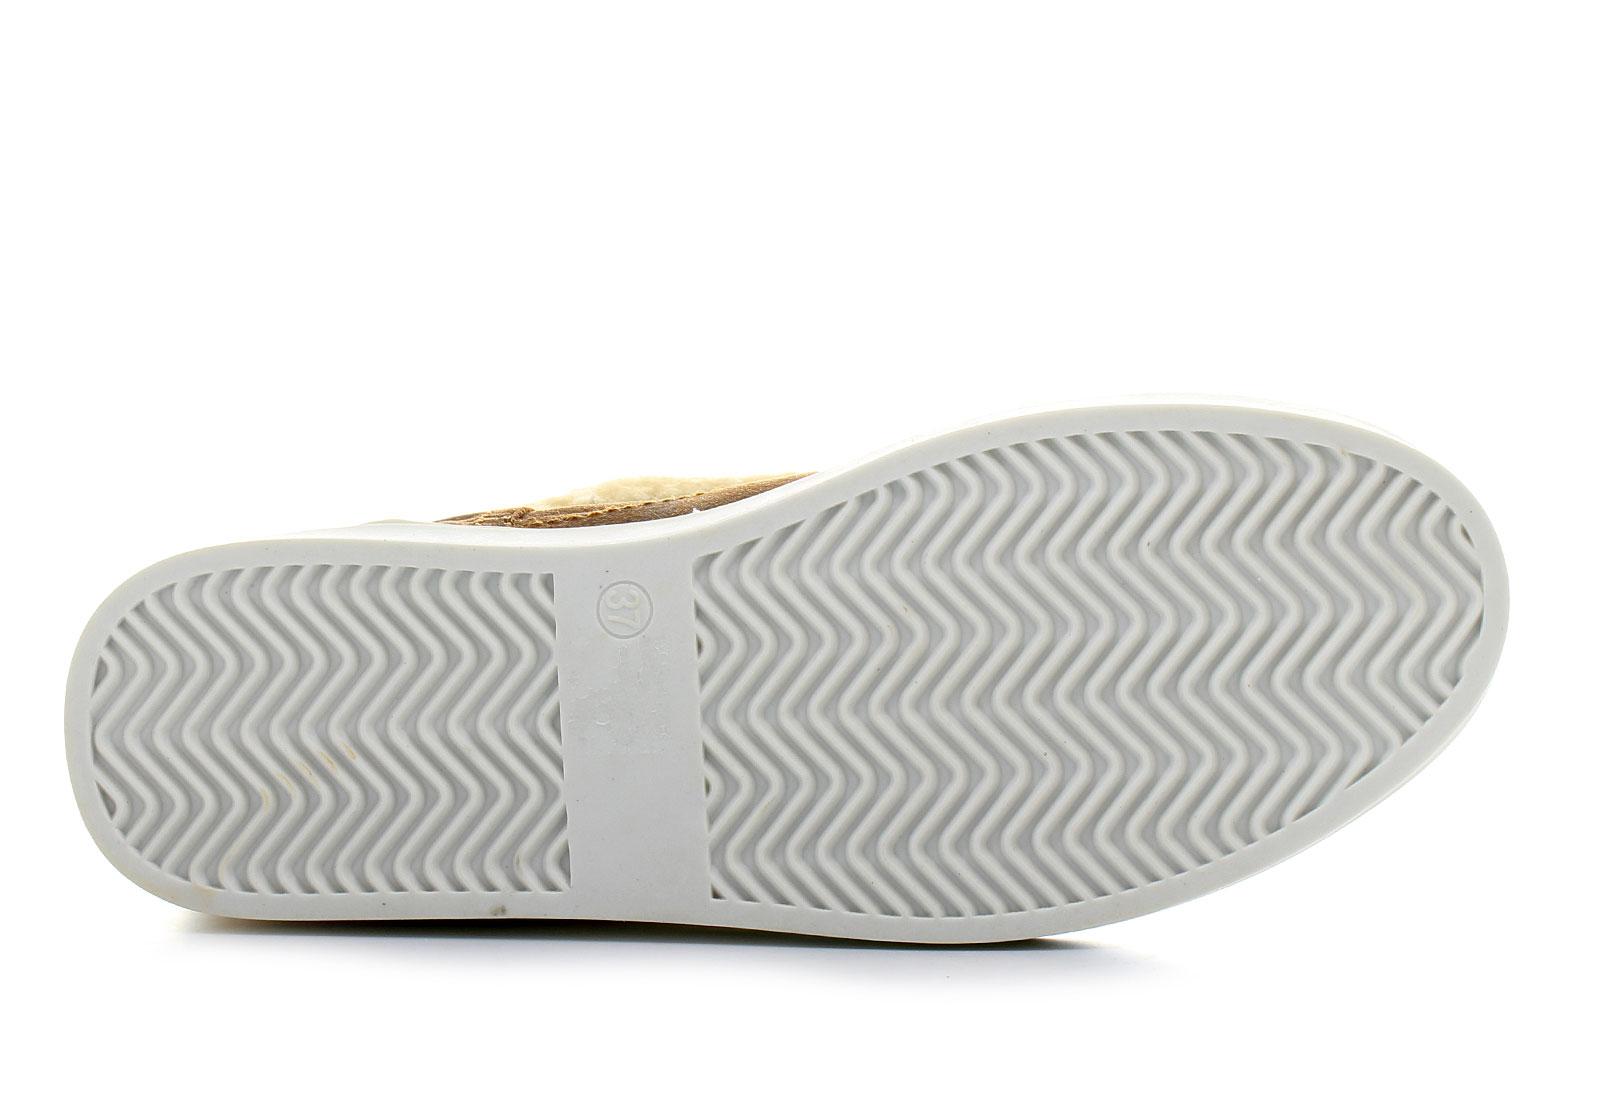 312bf69e11 Blink Casual Braon Čizme - Zenske cizme blink - Office Shoes ...